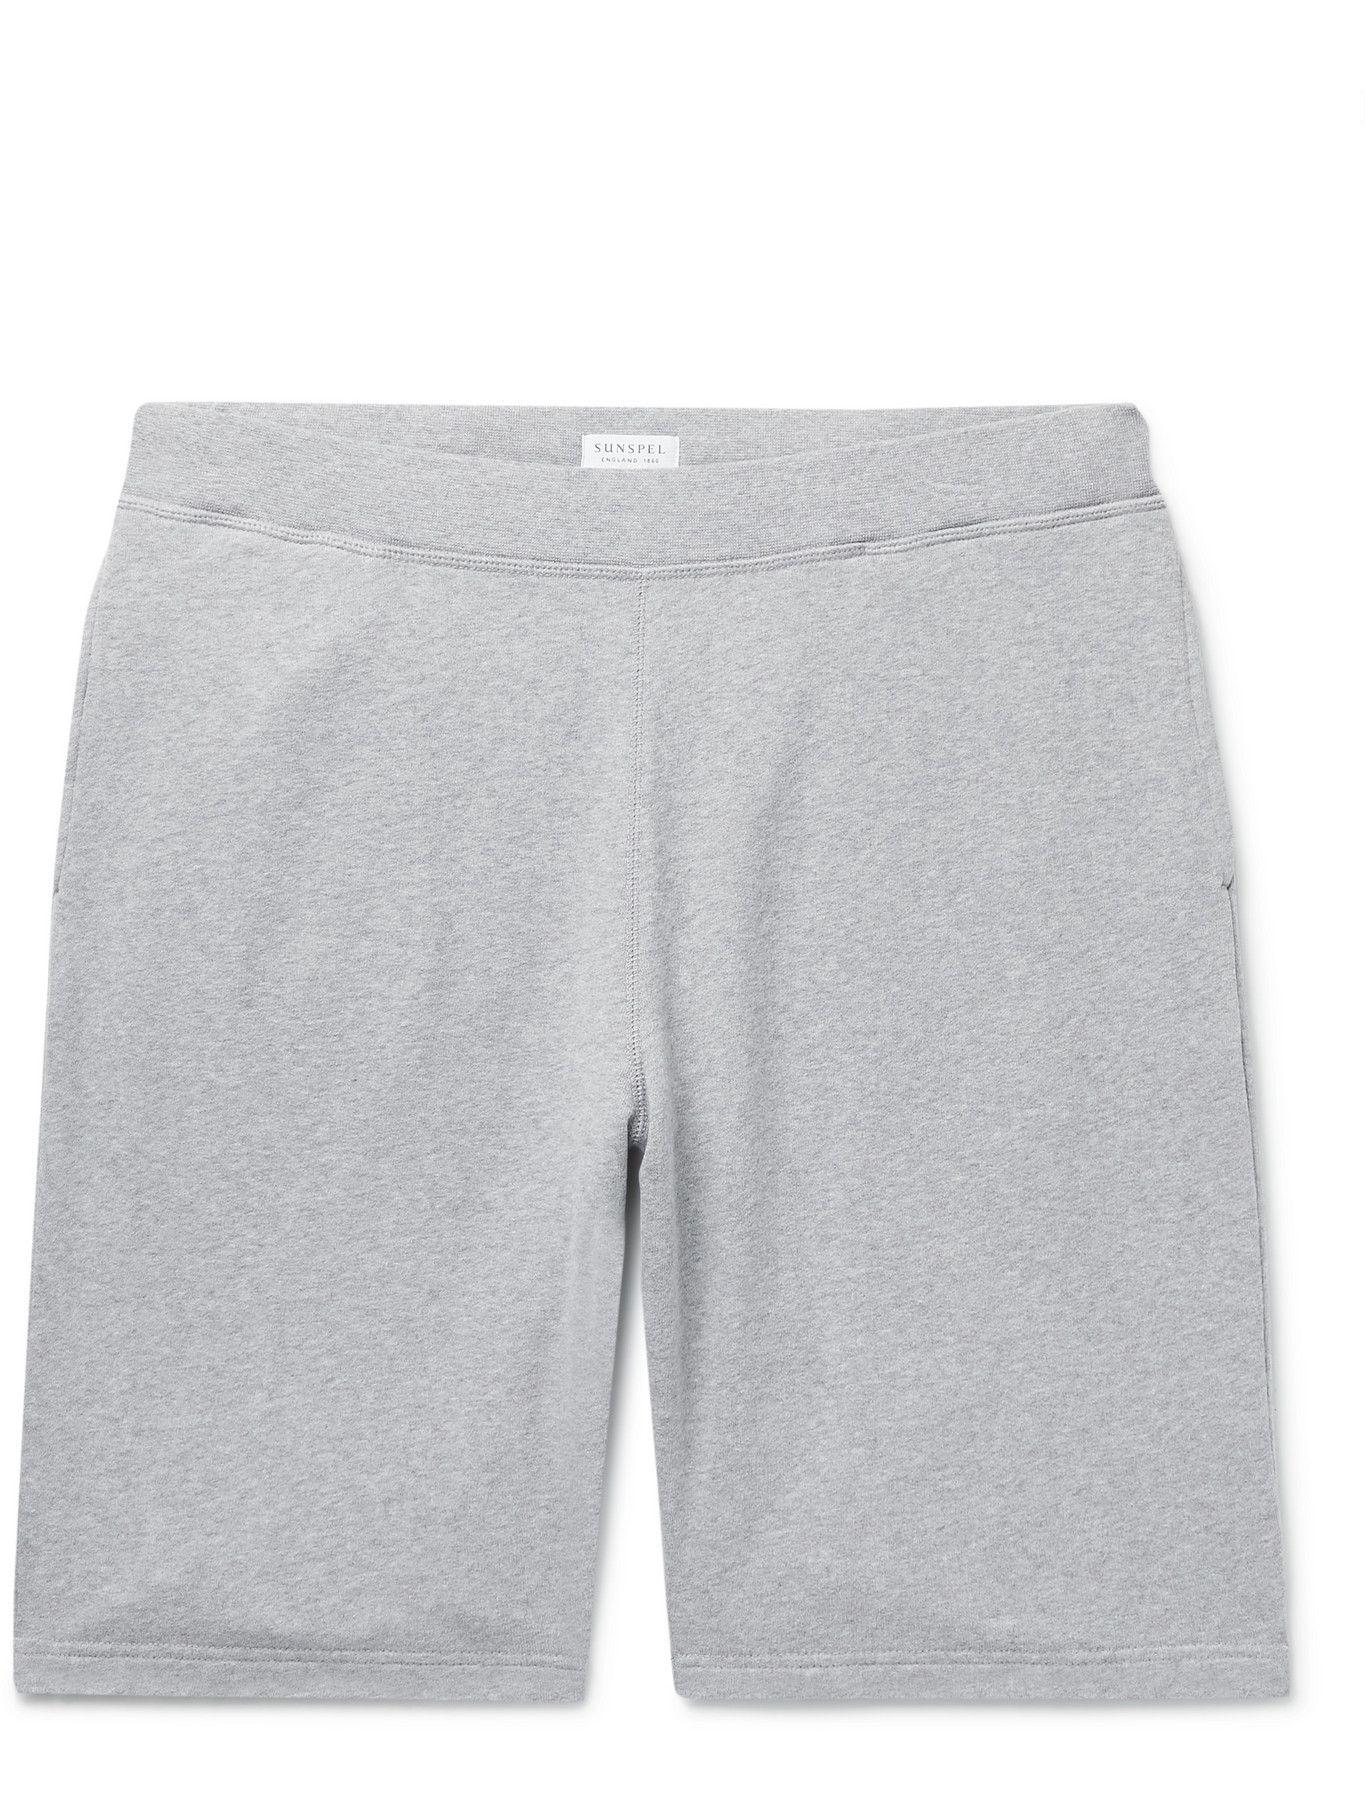 Photo: Sunspel - Cotton-Jersey Shorts - Gray